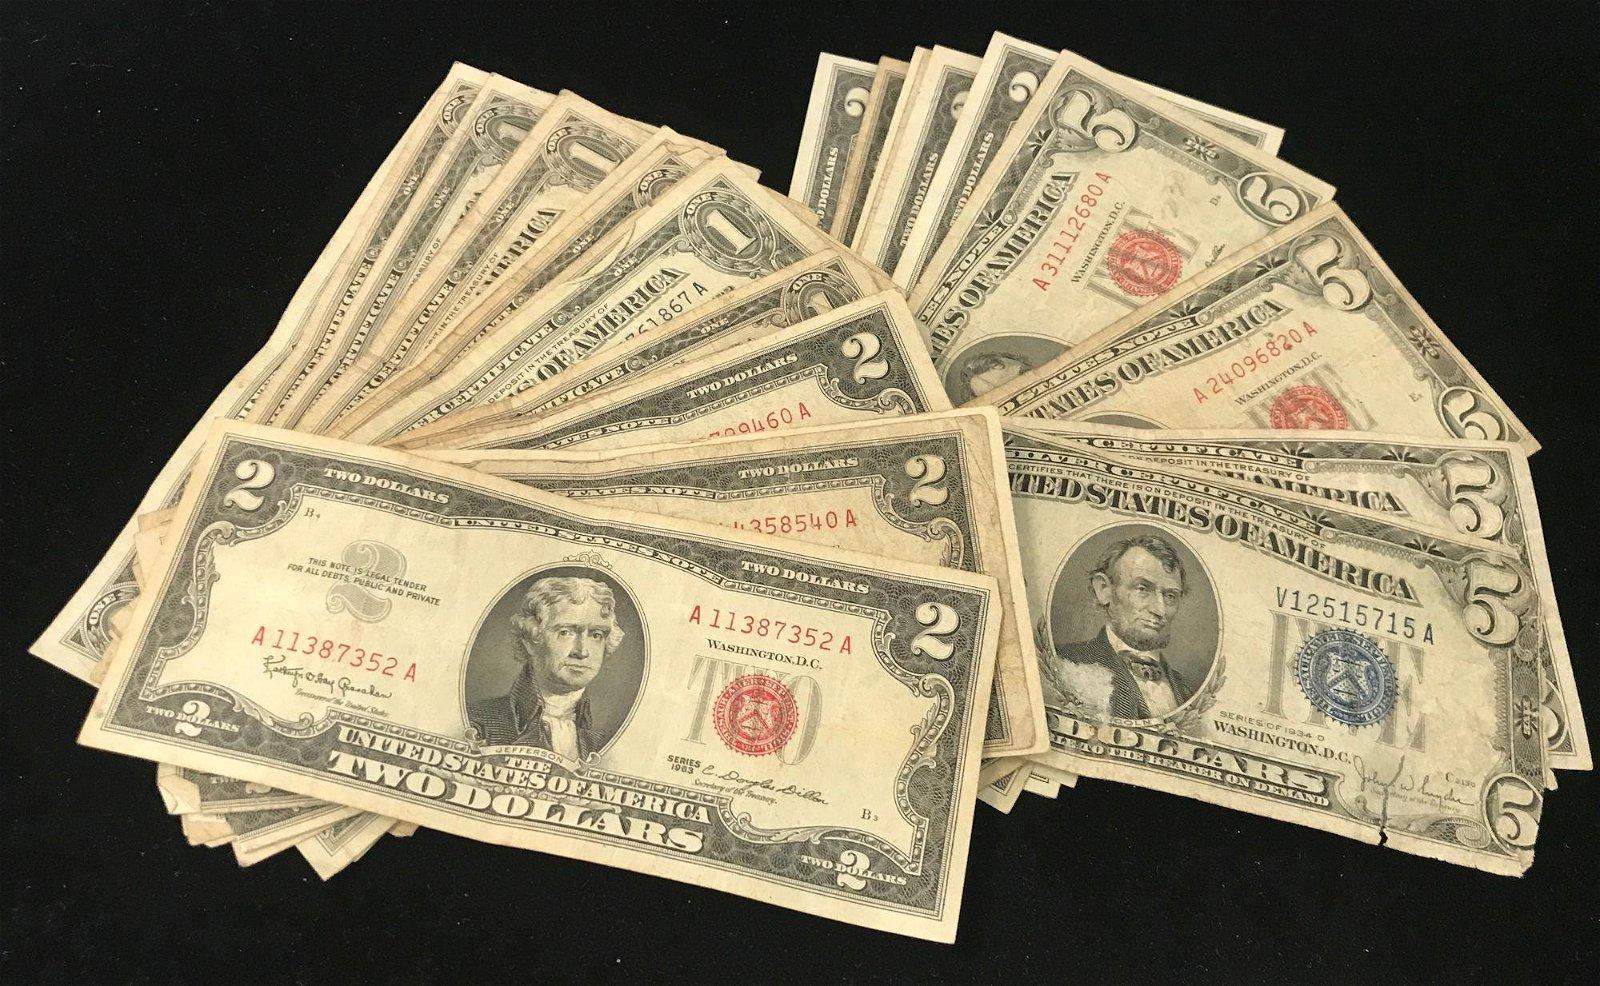 2 SERIES 1934 FIVE DOLLAR SILVER CERTIFICATES, 2 SERIES